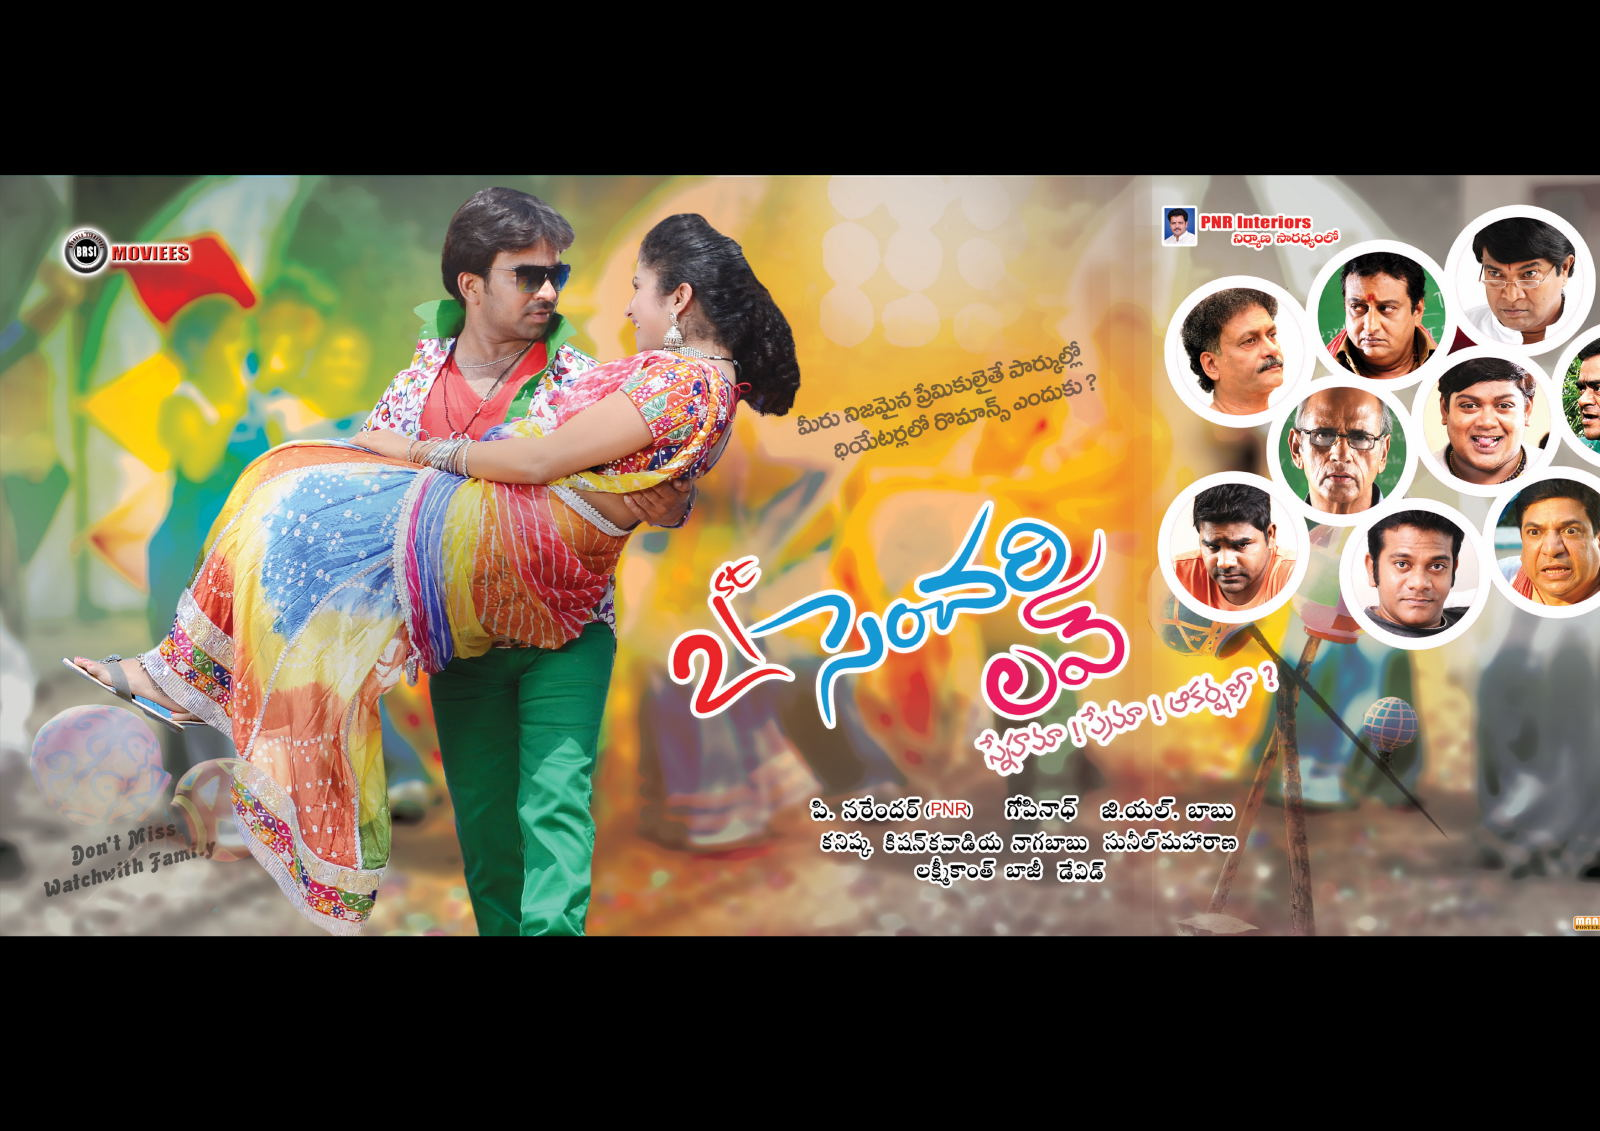 love 2015 movie download free